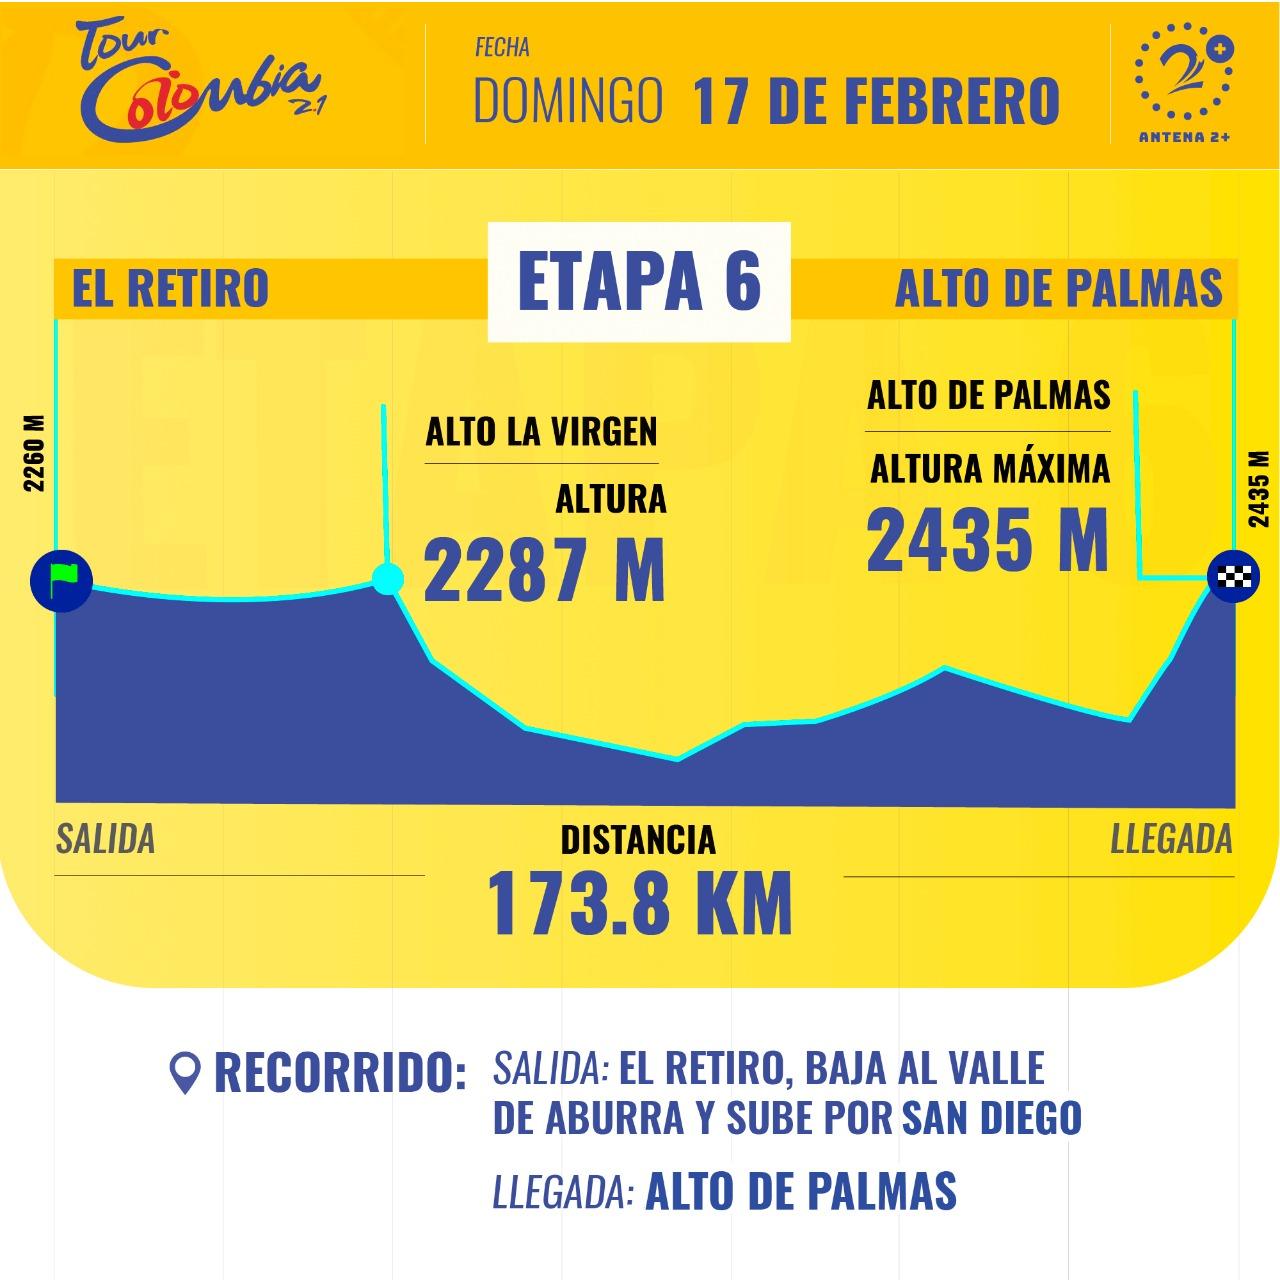 Sexta etapa del Tour Colombia 2.1.